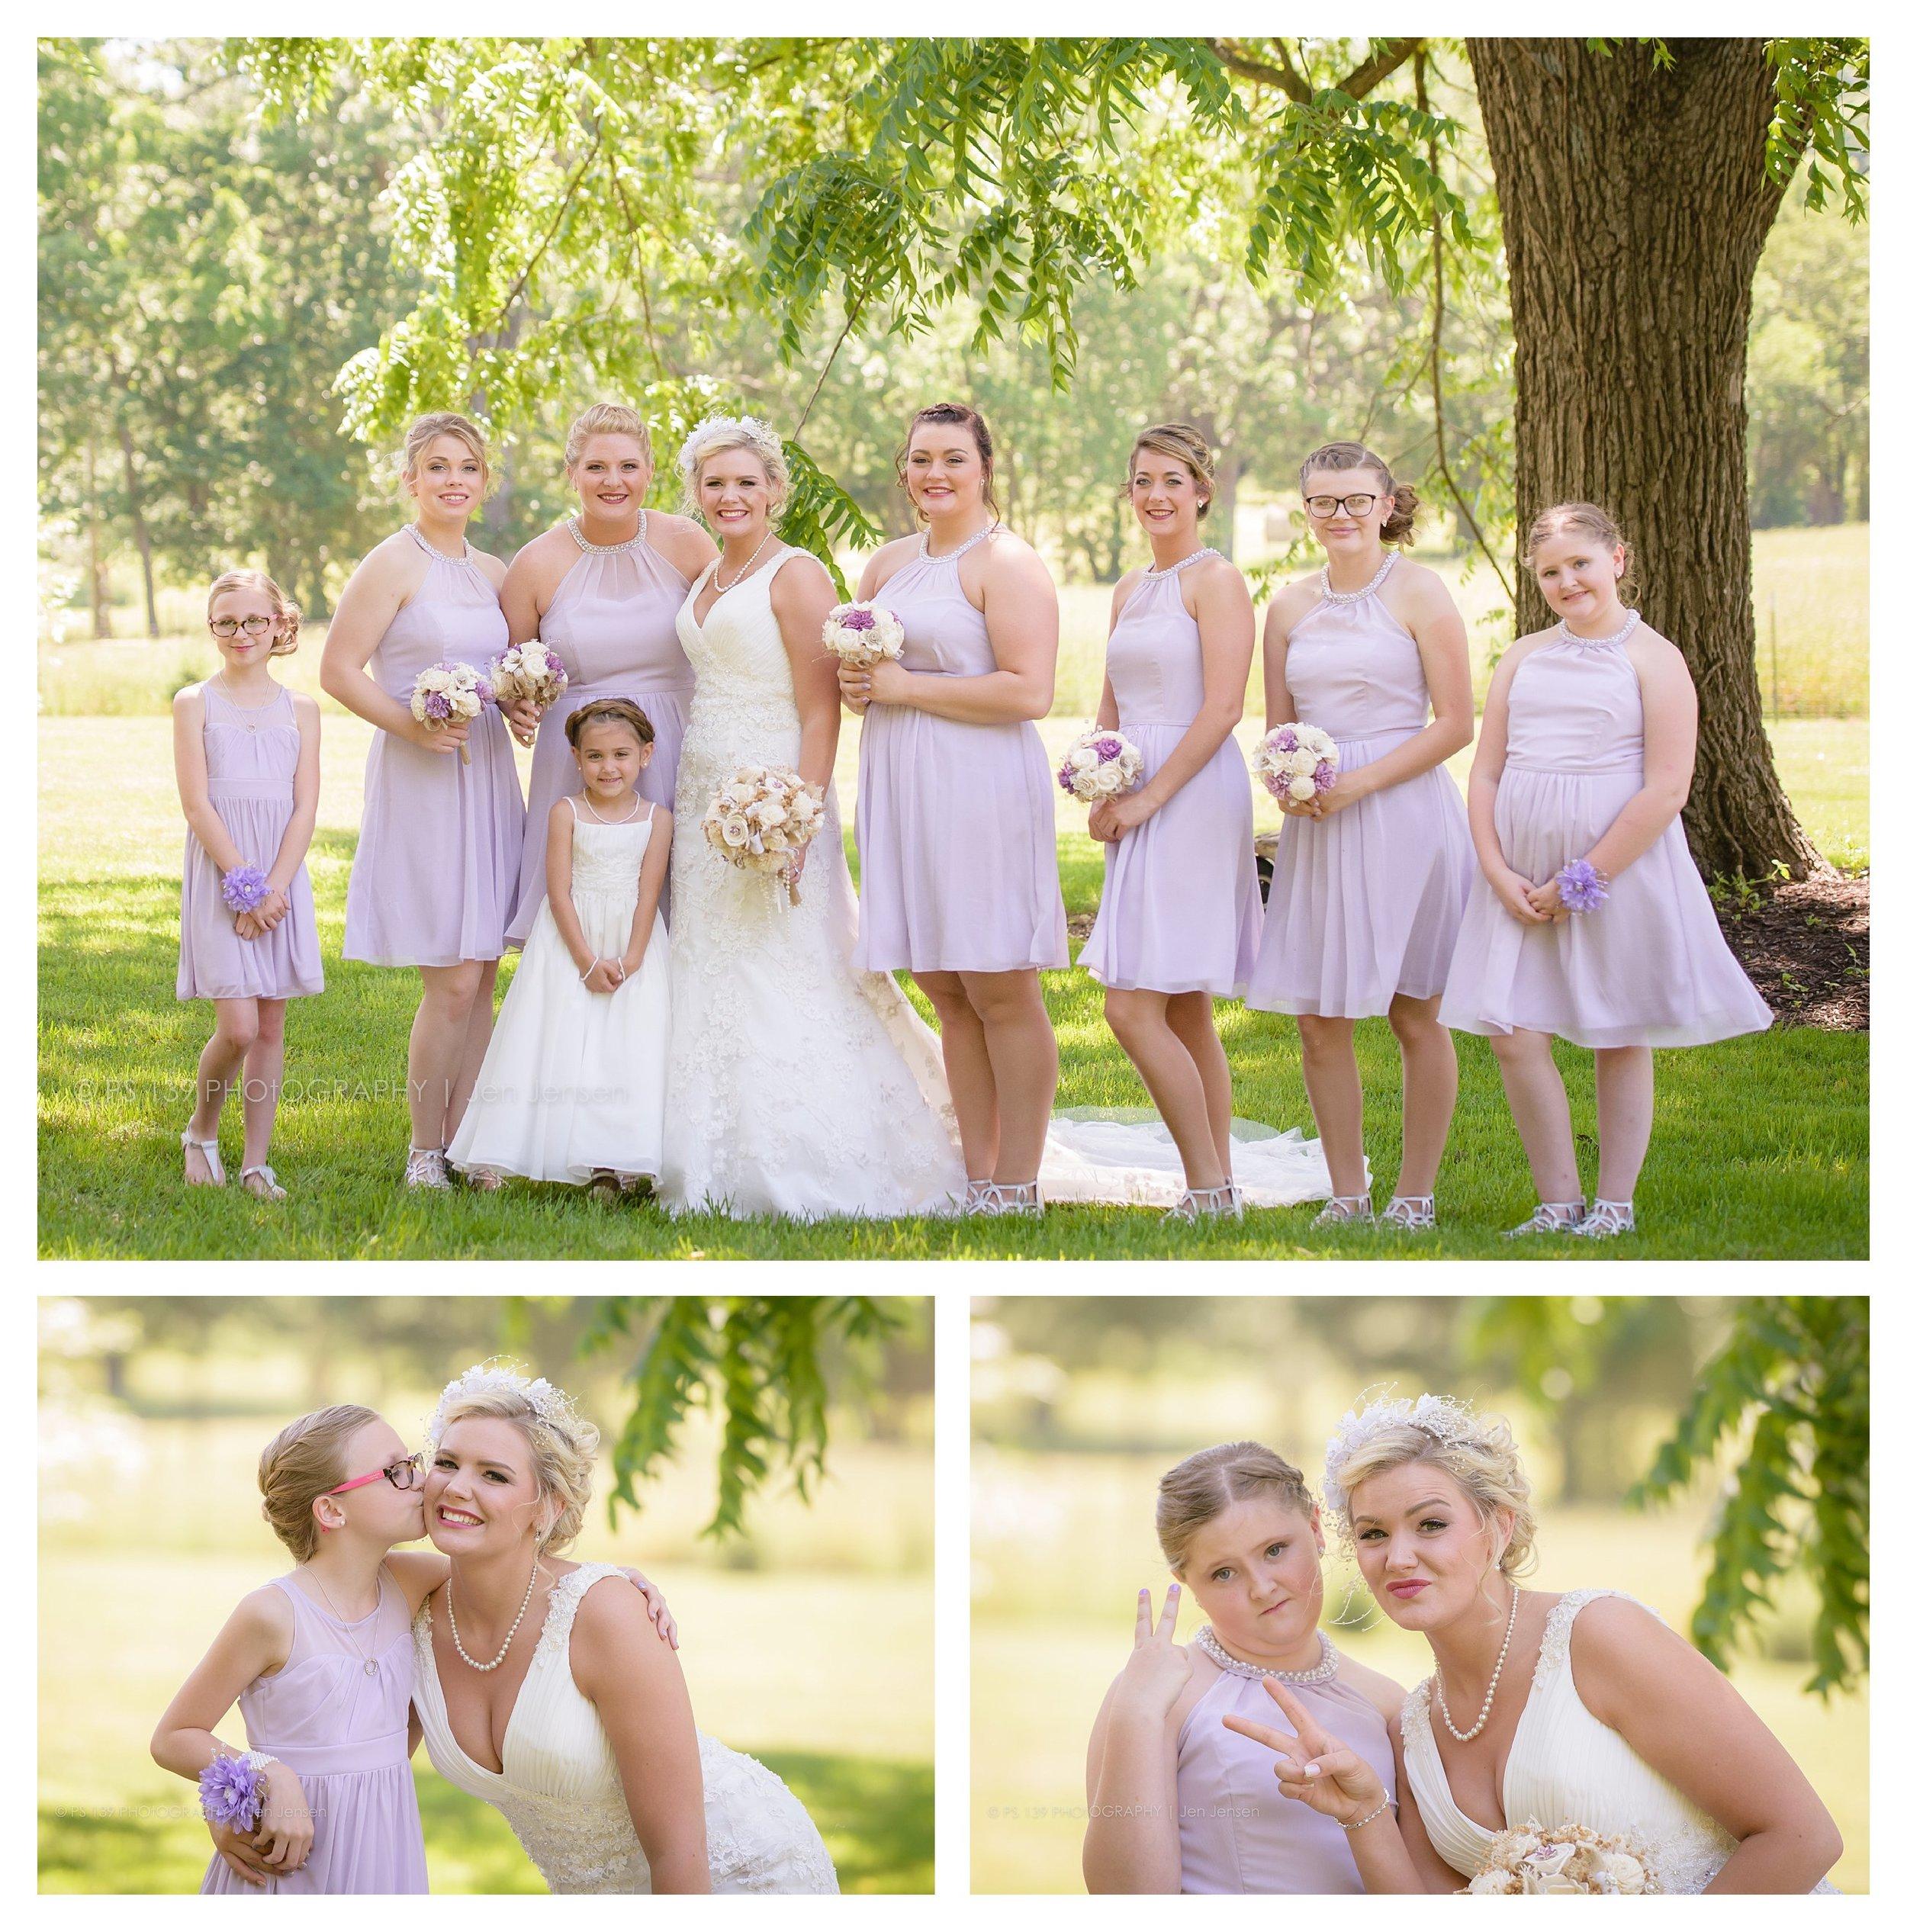 oregon Illinois oak lane farm wisconsin wedding photographer bayfield wi ps 139 photography jen jensen_0265.jpg